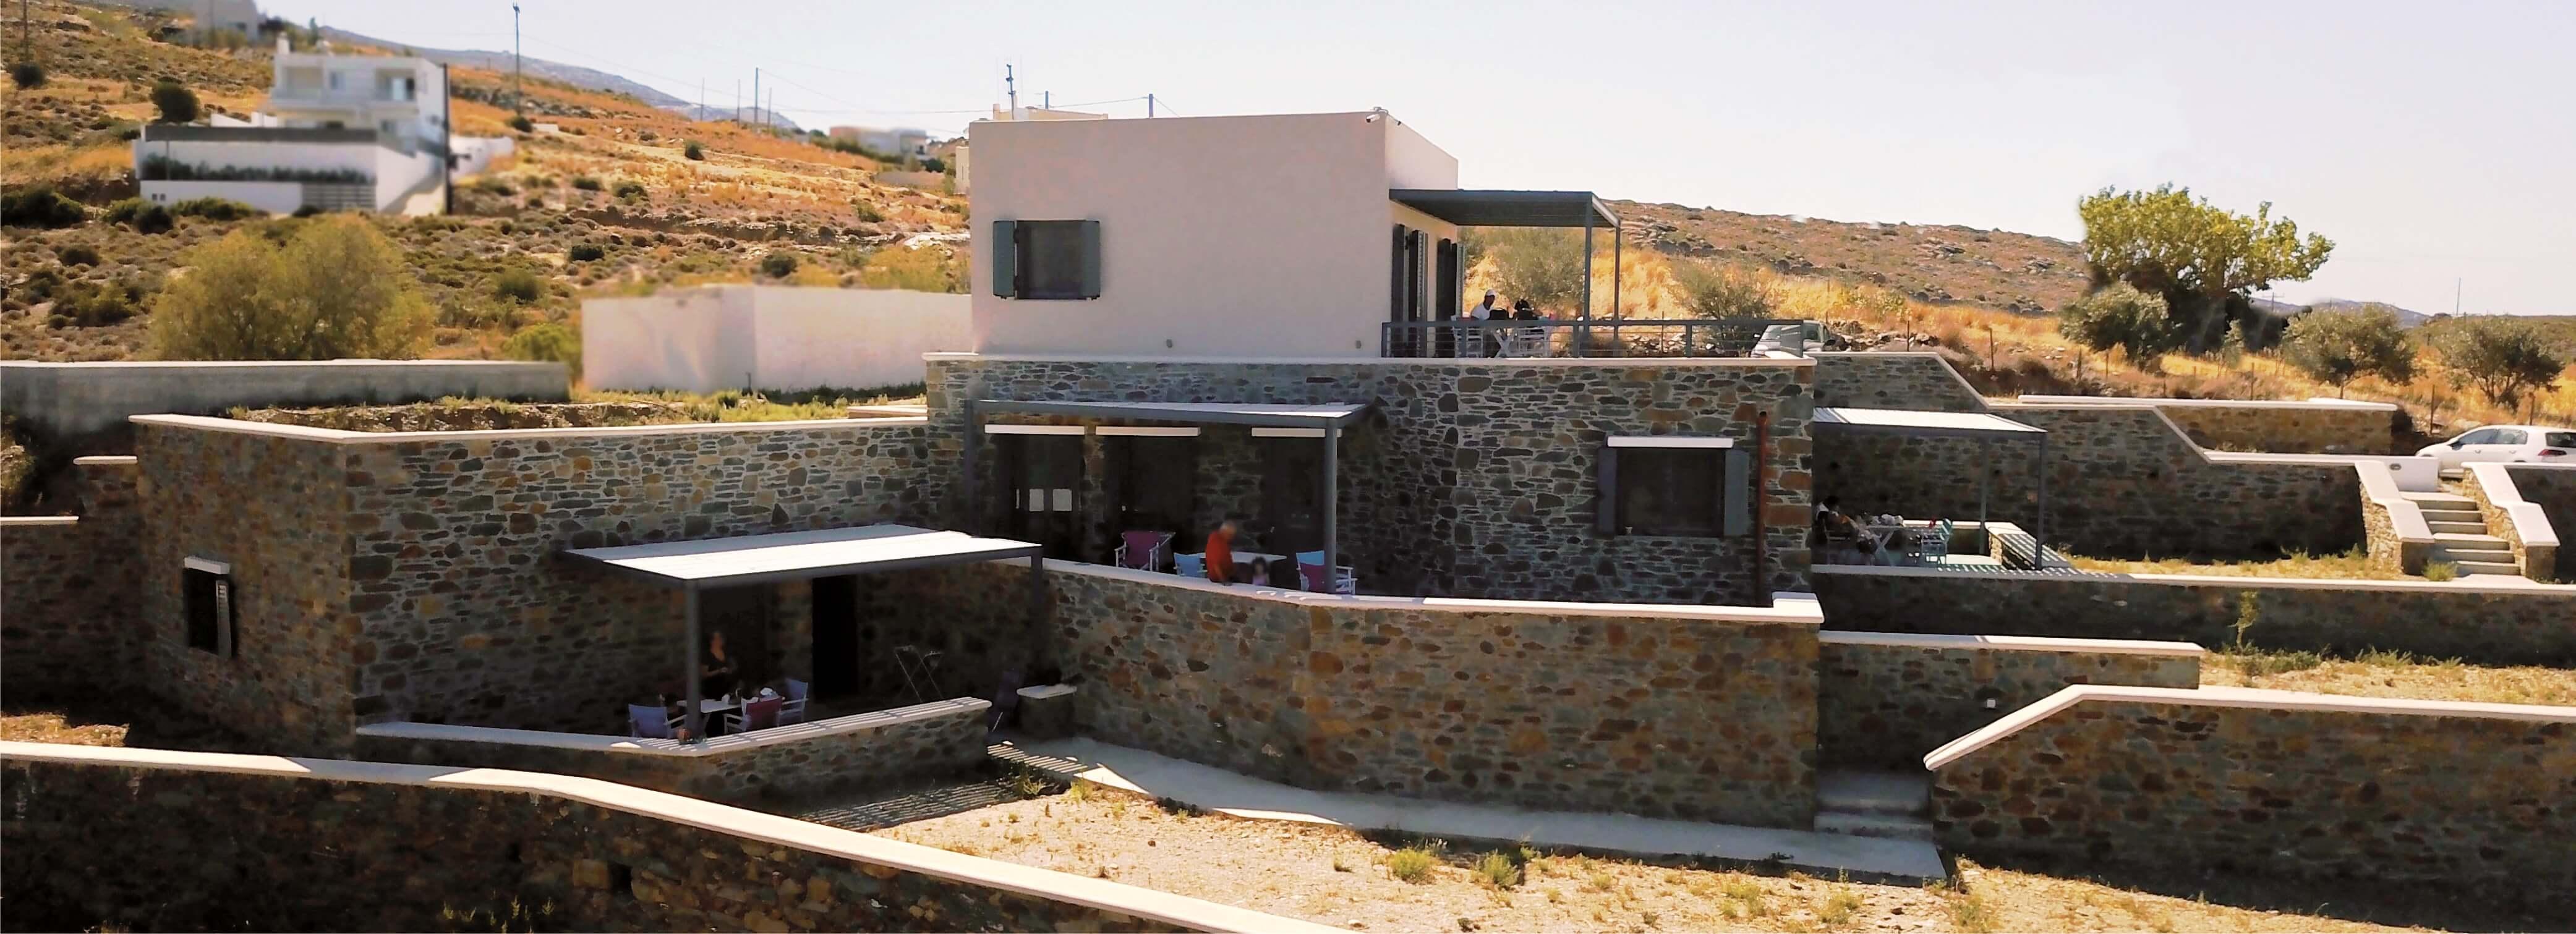 Karystos rent house Kavos Ενοικιαζόμενα παραθαλάσσια κατοικία σπίτι Κάρυστος Κάβος